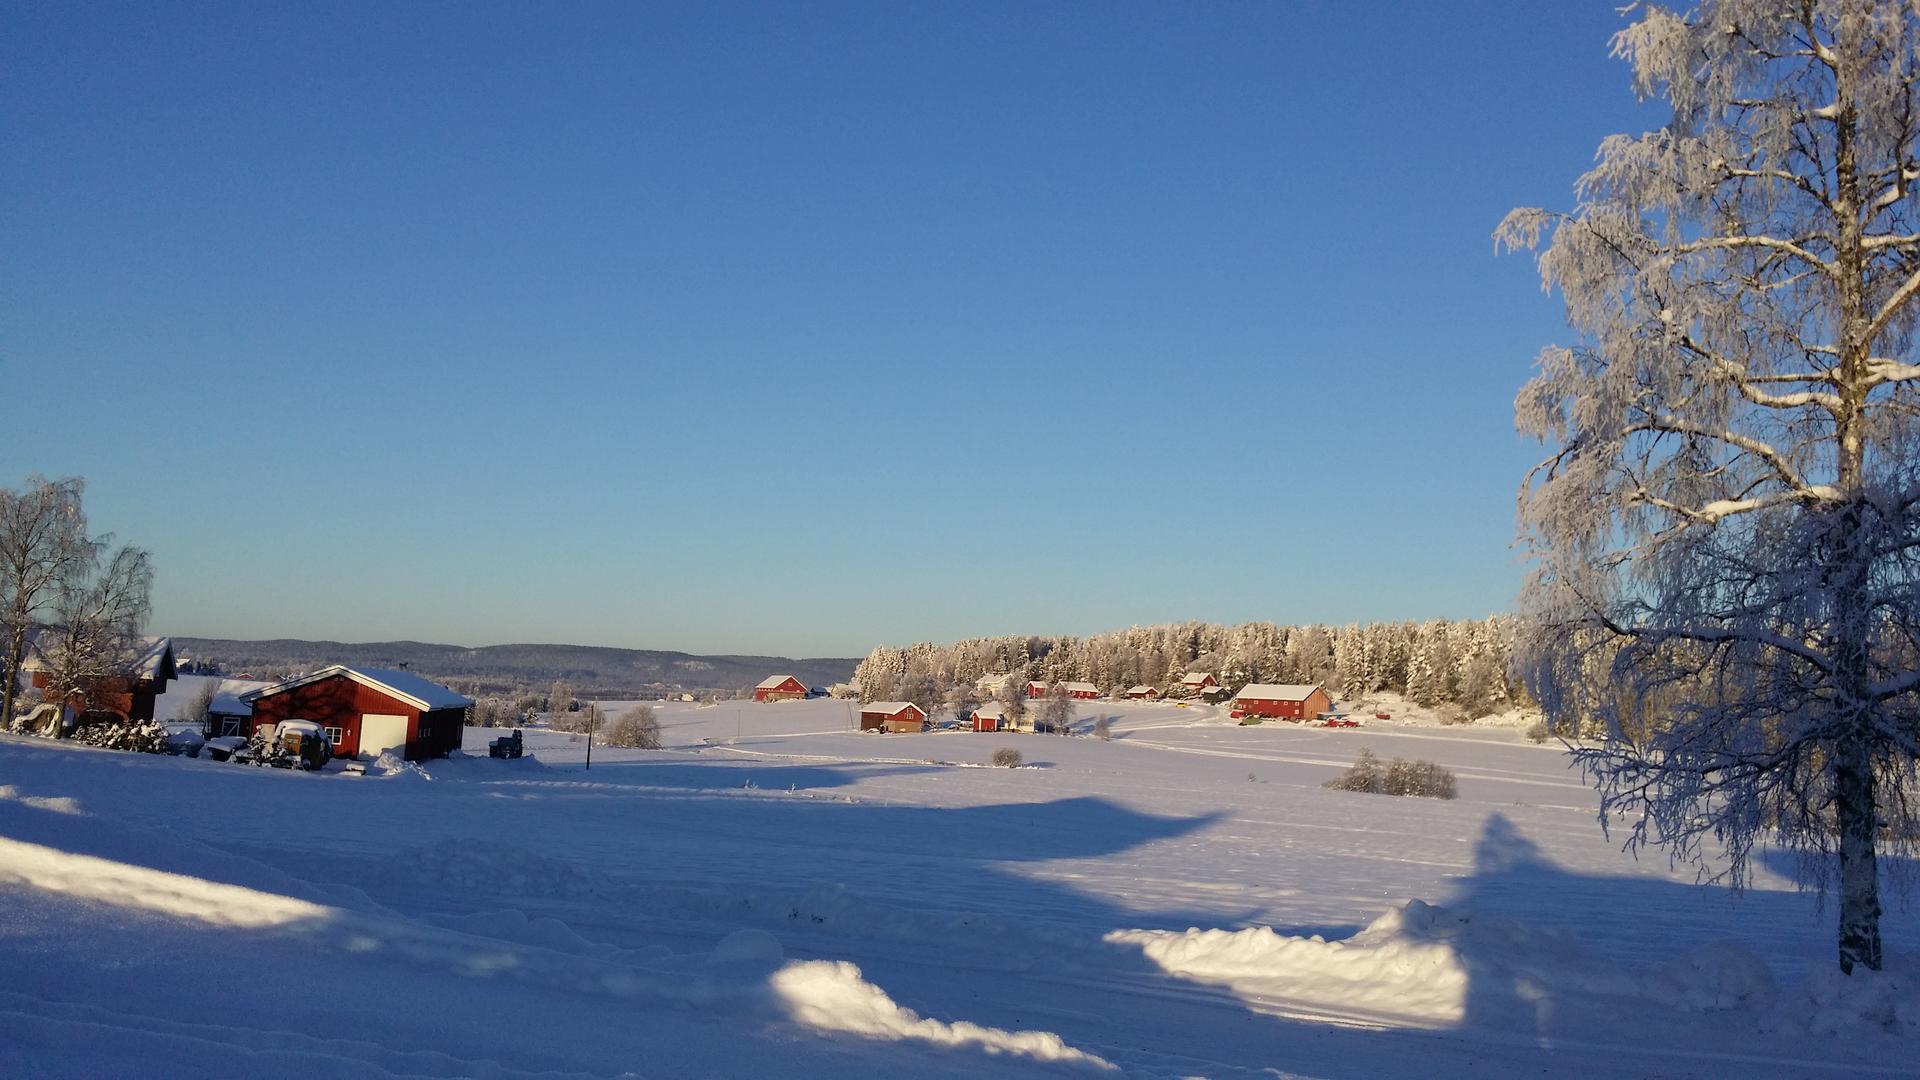 Vinter, snø, trær, små hus.